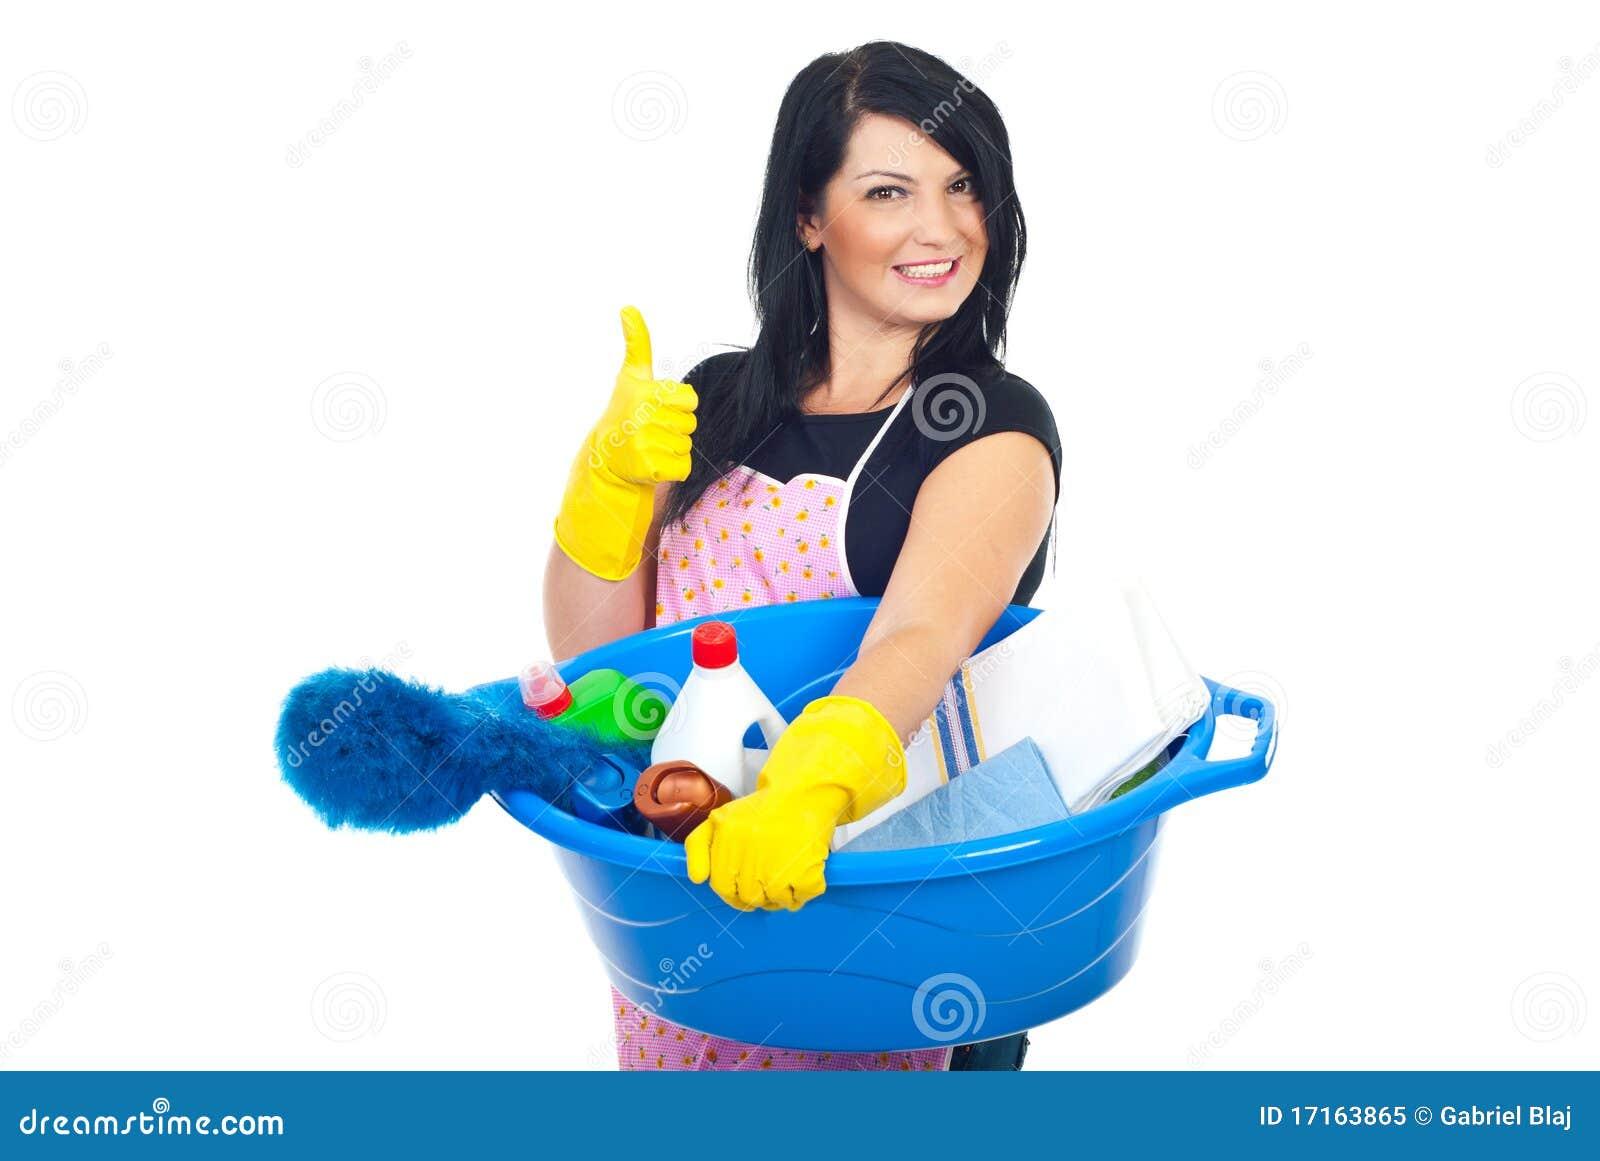 Successful cleaning woman stock image image of female - Imagenes de limpieza de casas ...